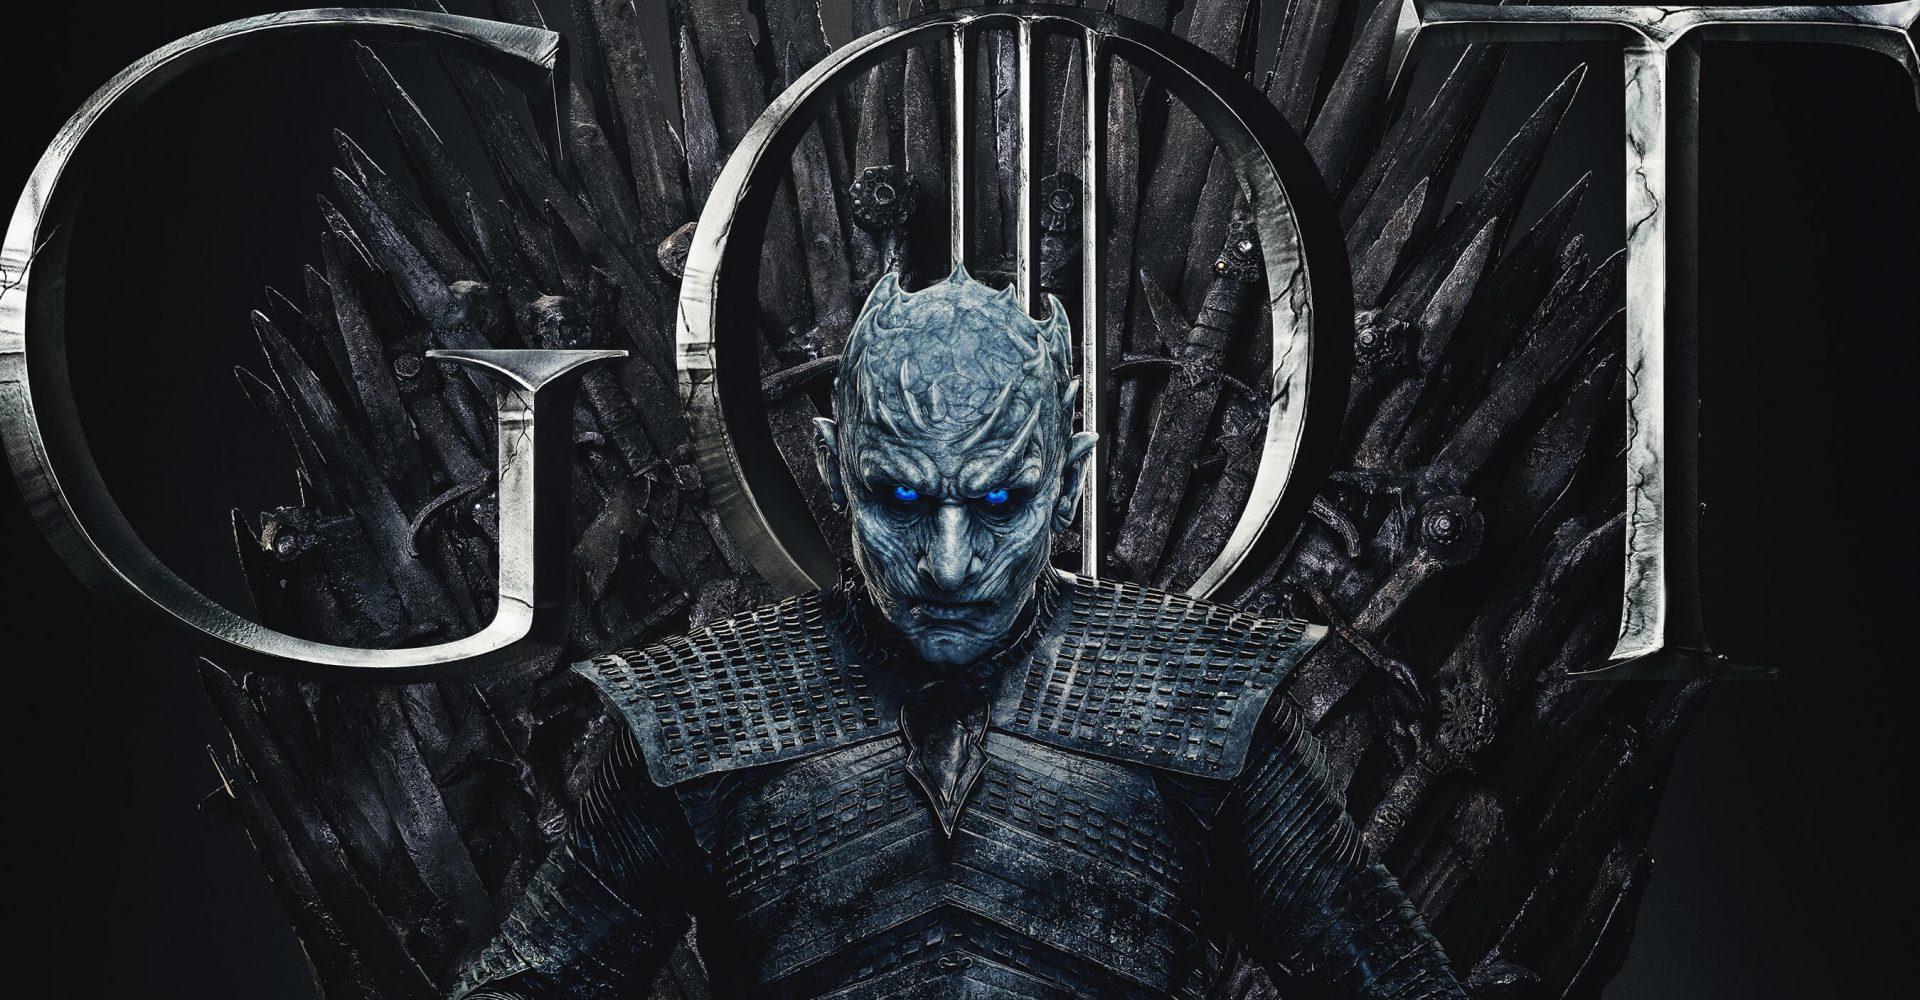 LGBT Characters & Scenes in Games of Thrones